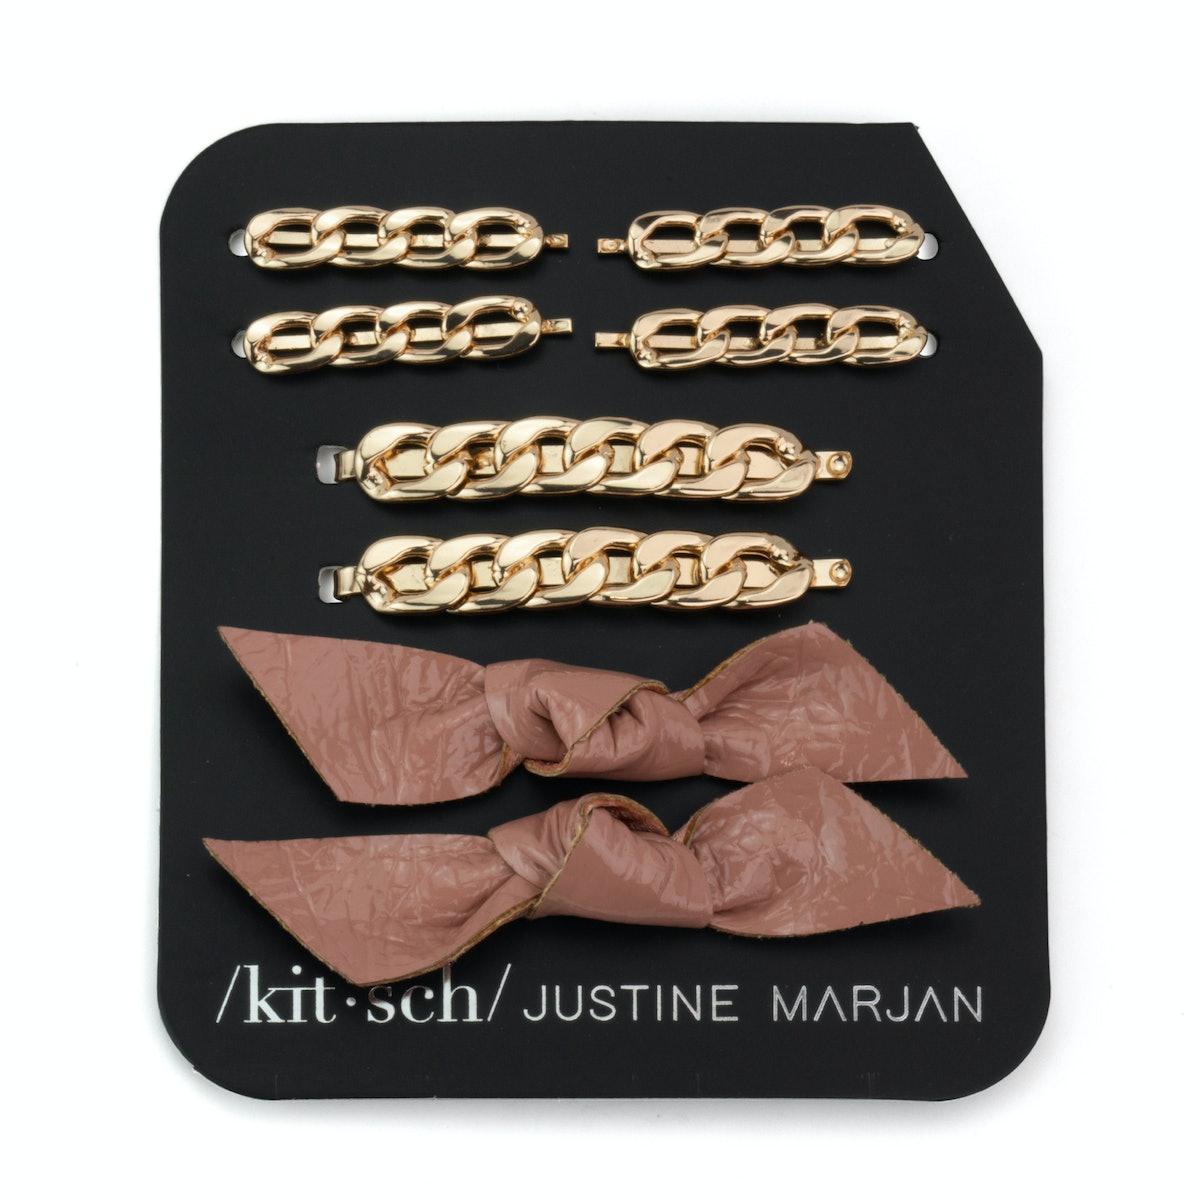 Kitsch x Justine Marjan Chain & Bow Bobby Pin — 8 PC Set